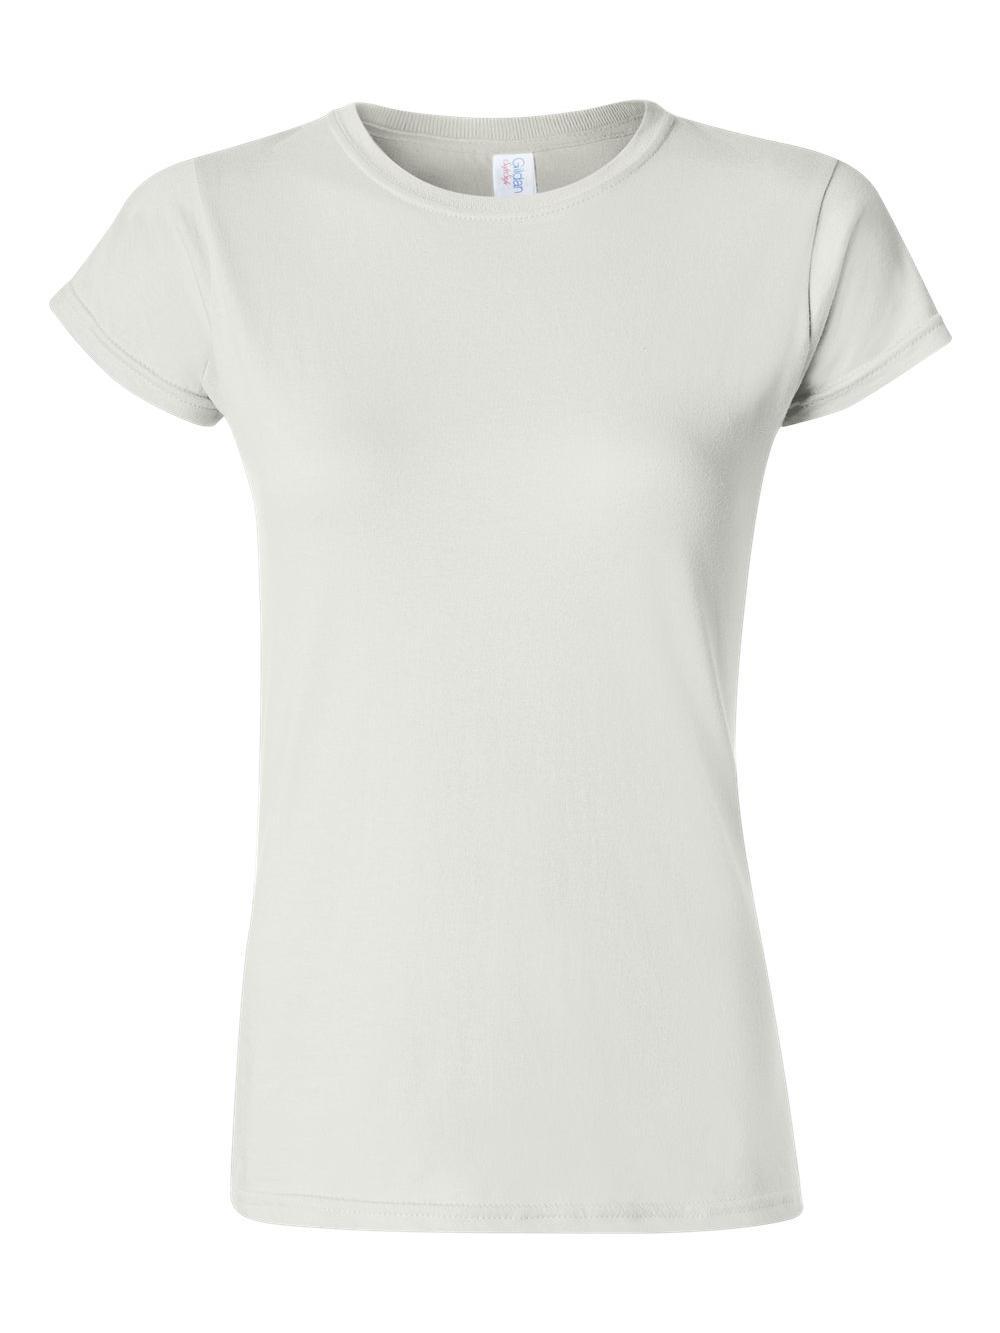 Gildan-Softstyle-Women-039-s-T-Shirt-64000L thumbnail 45